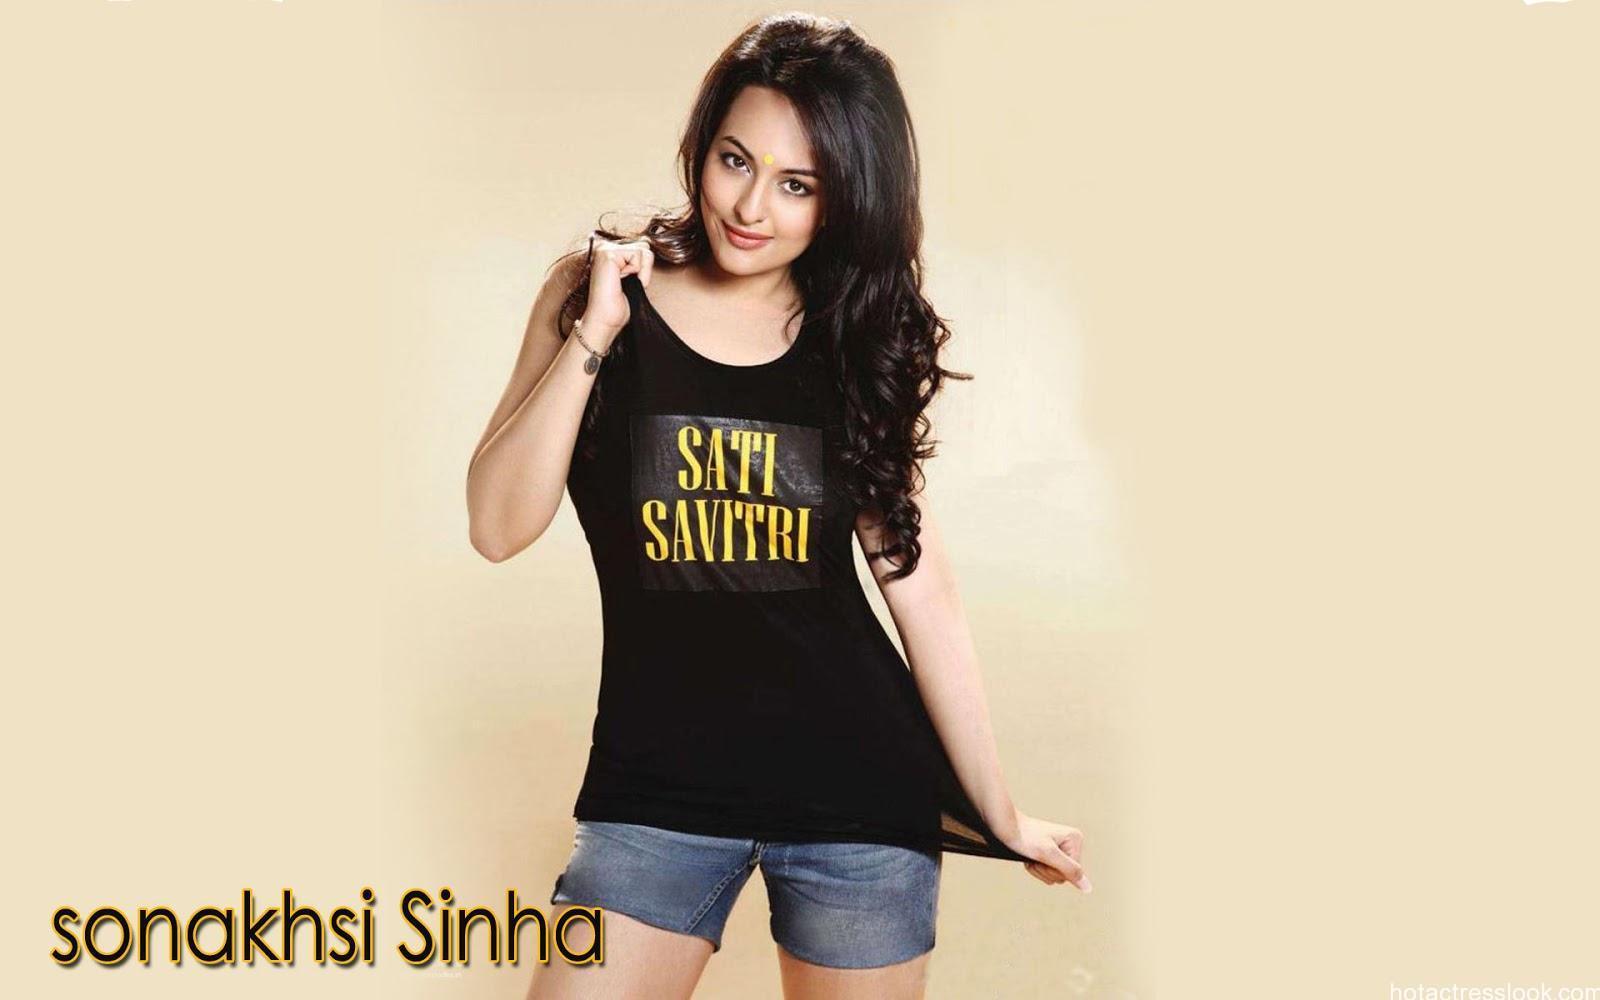 Sonakshi-Sinha looking sexy